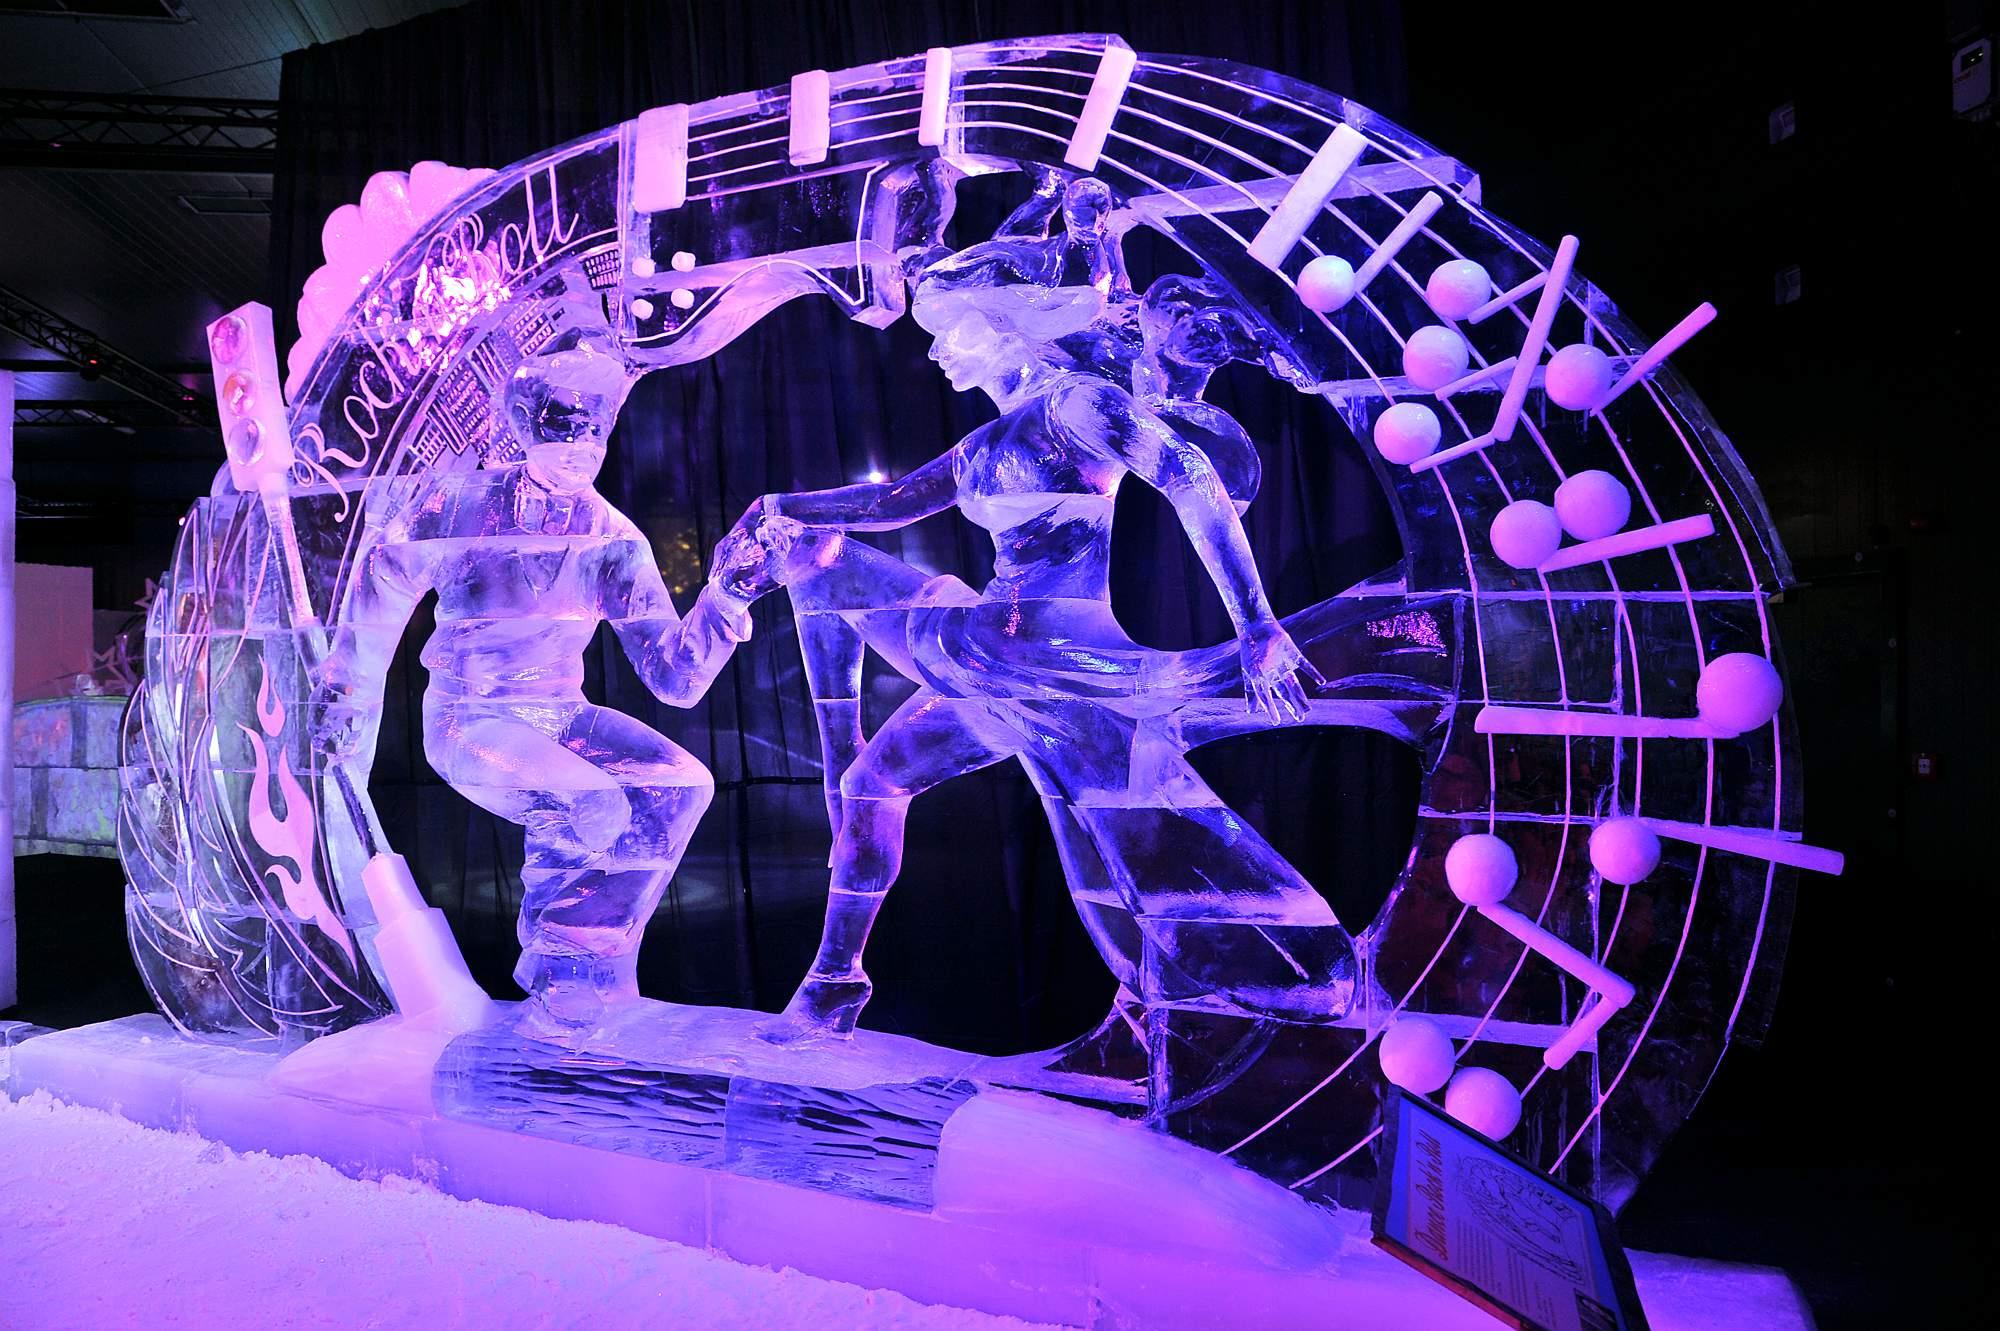 Karls 12. Eiswelt: Rock 'n' Roll. Foto: Joachim Kloock